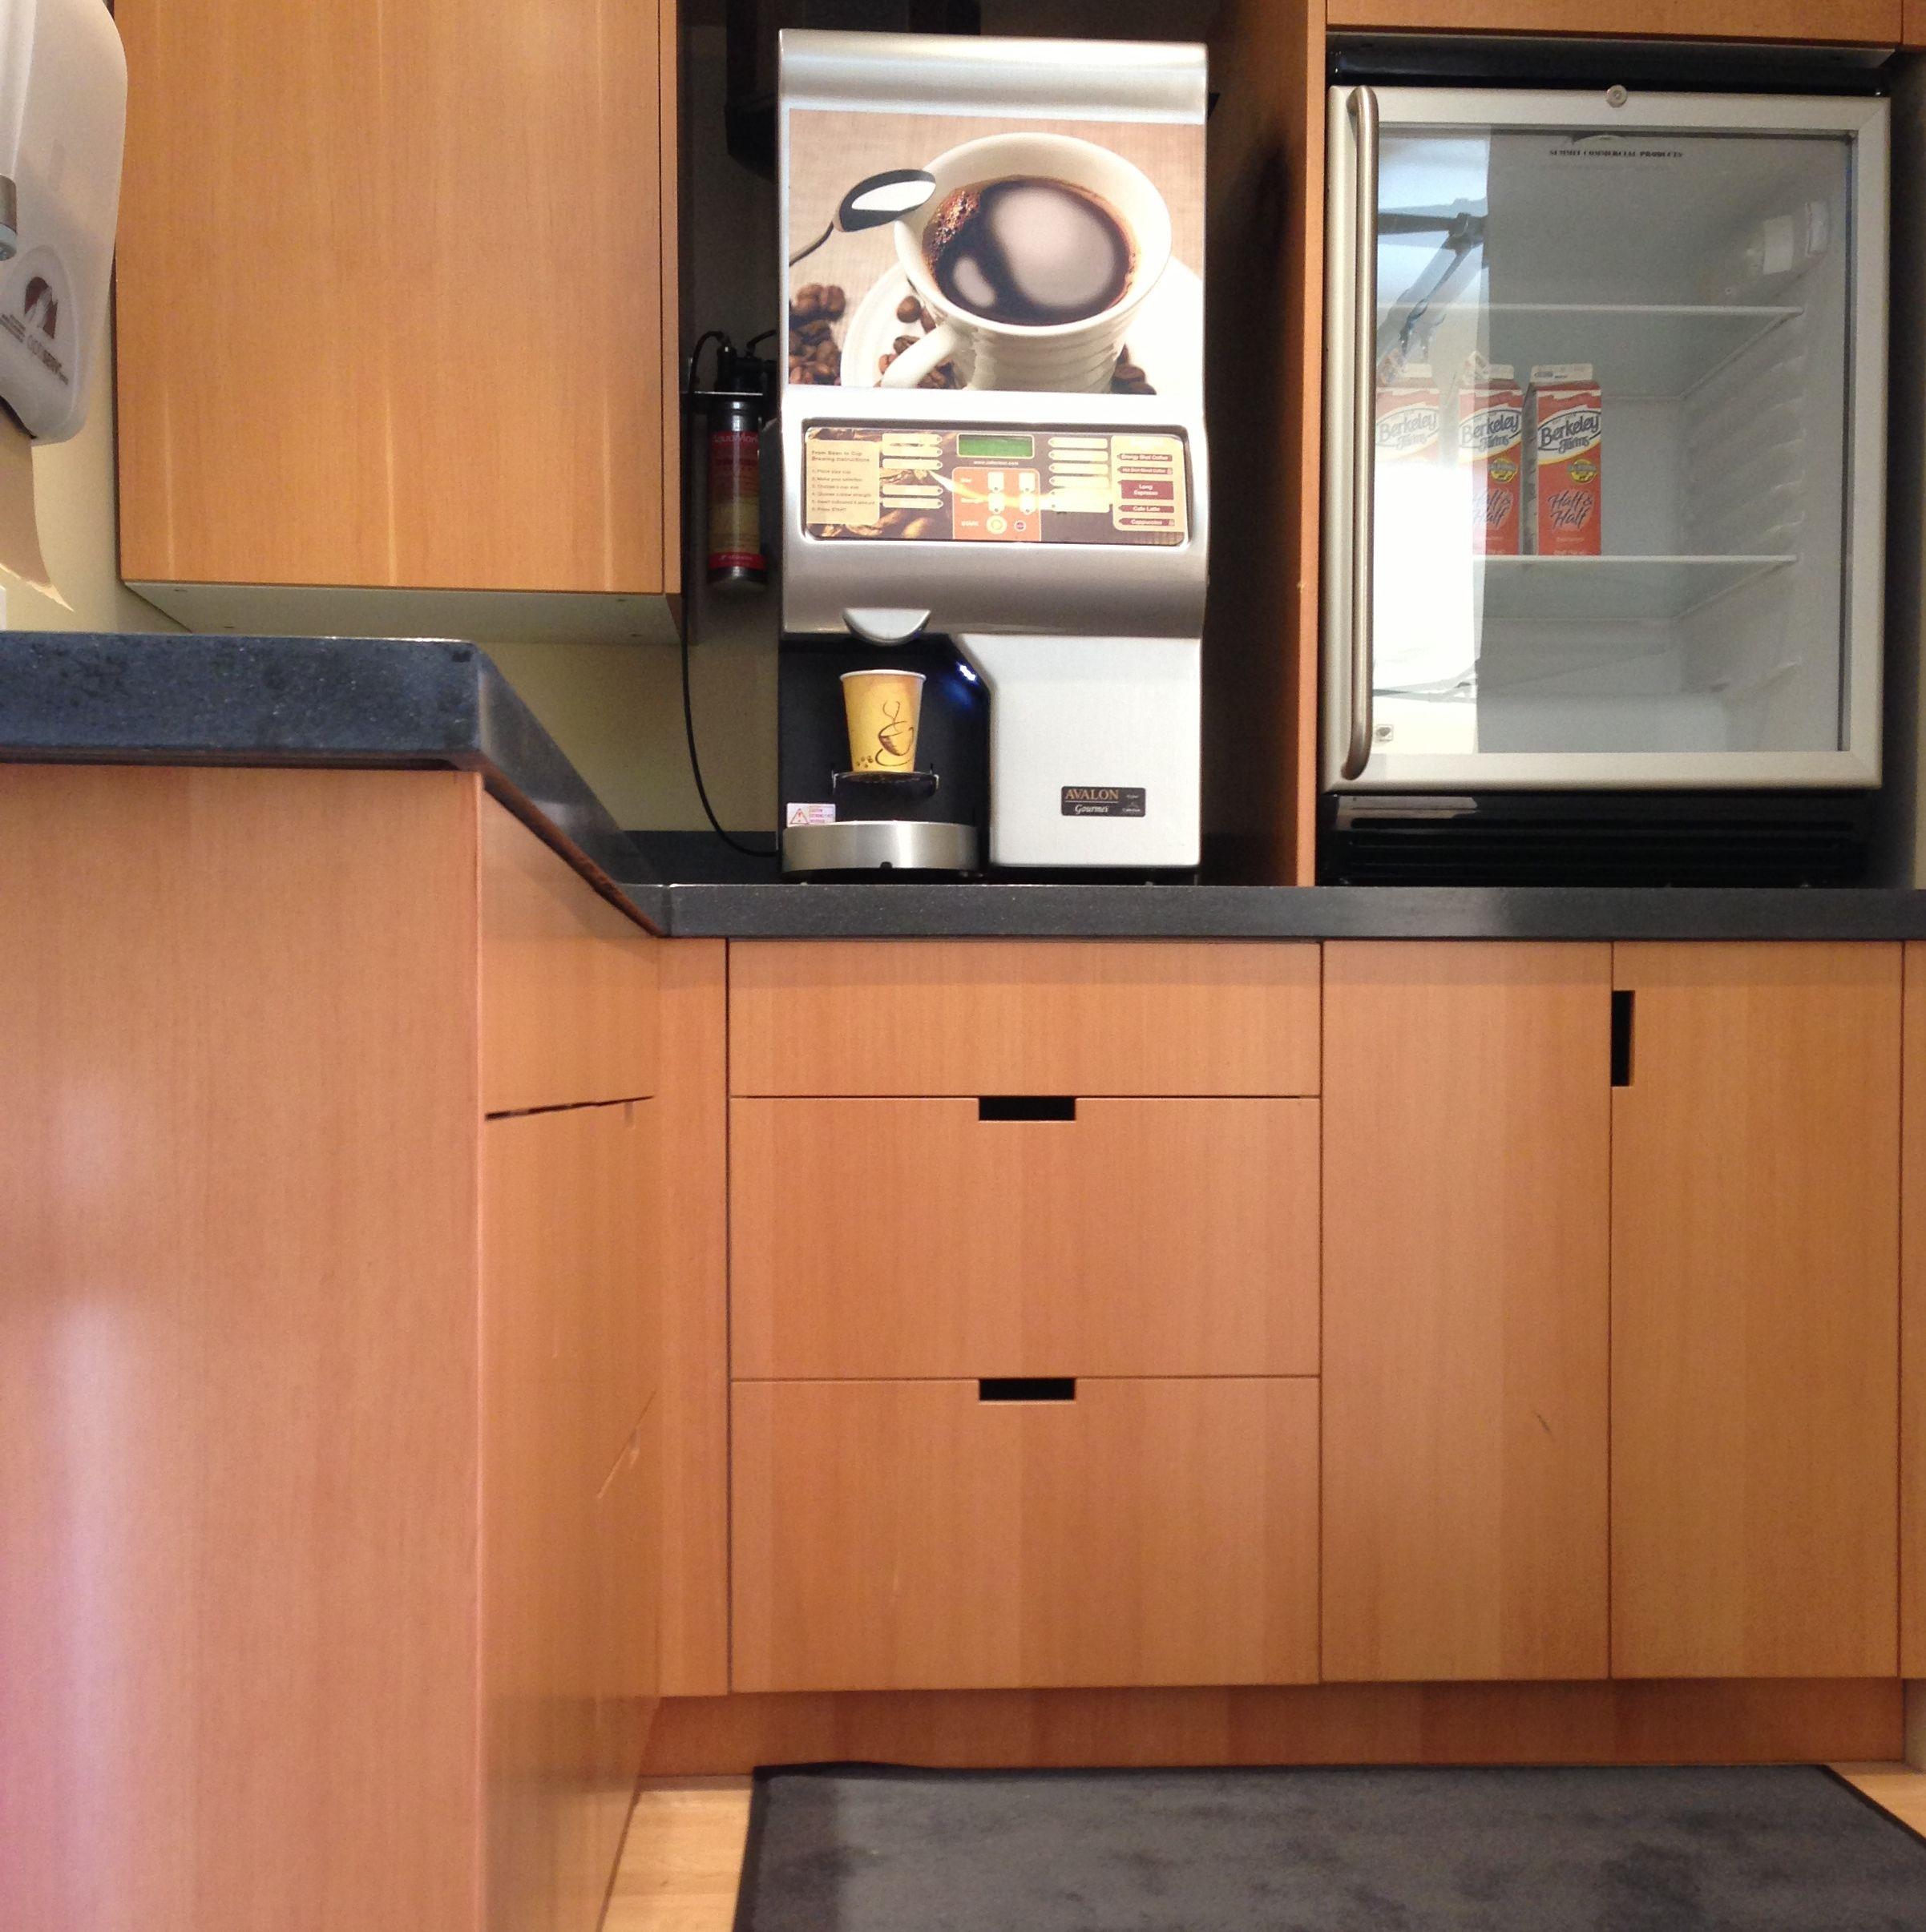 Semihandmade douglas fir ikea office kitchen in oakland for Bureau wenge ikea